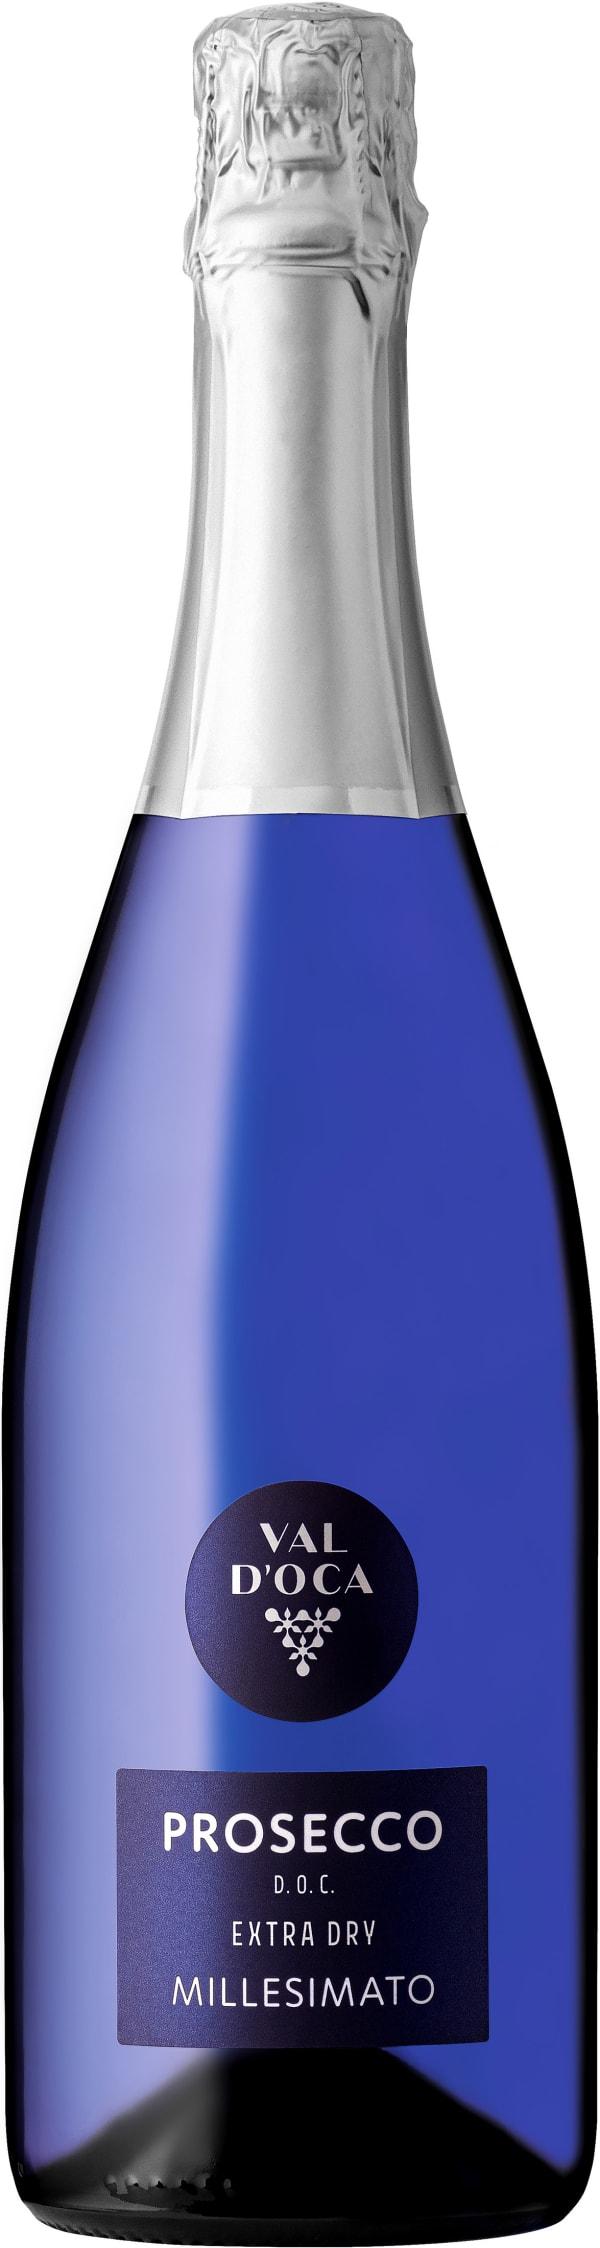 Val d'Oca Millesimato Prosecco Extra Dry 2016